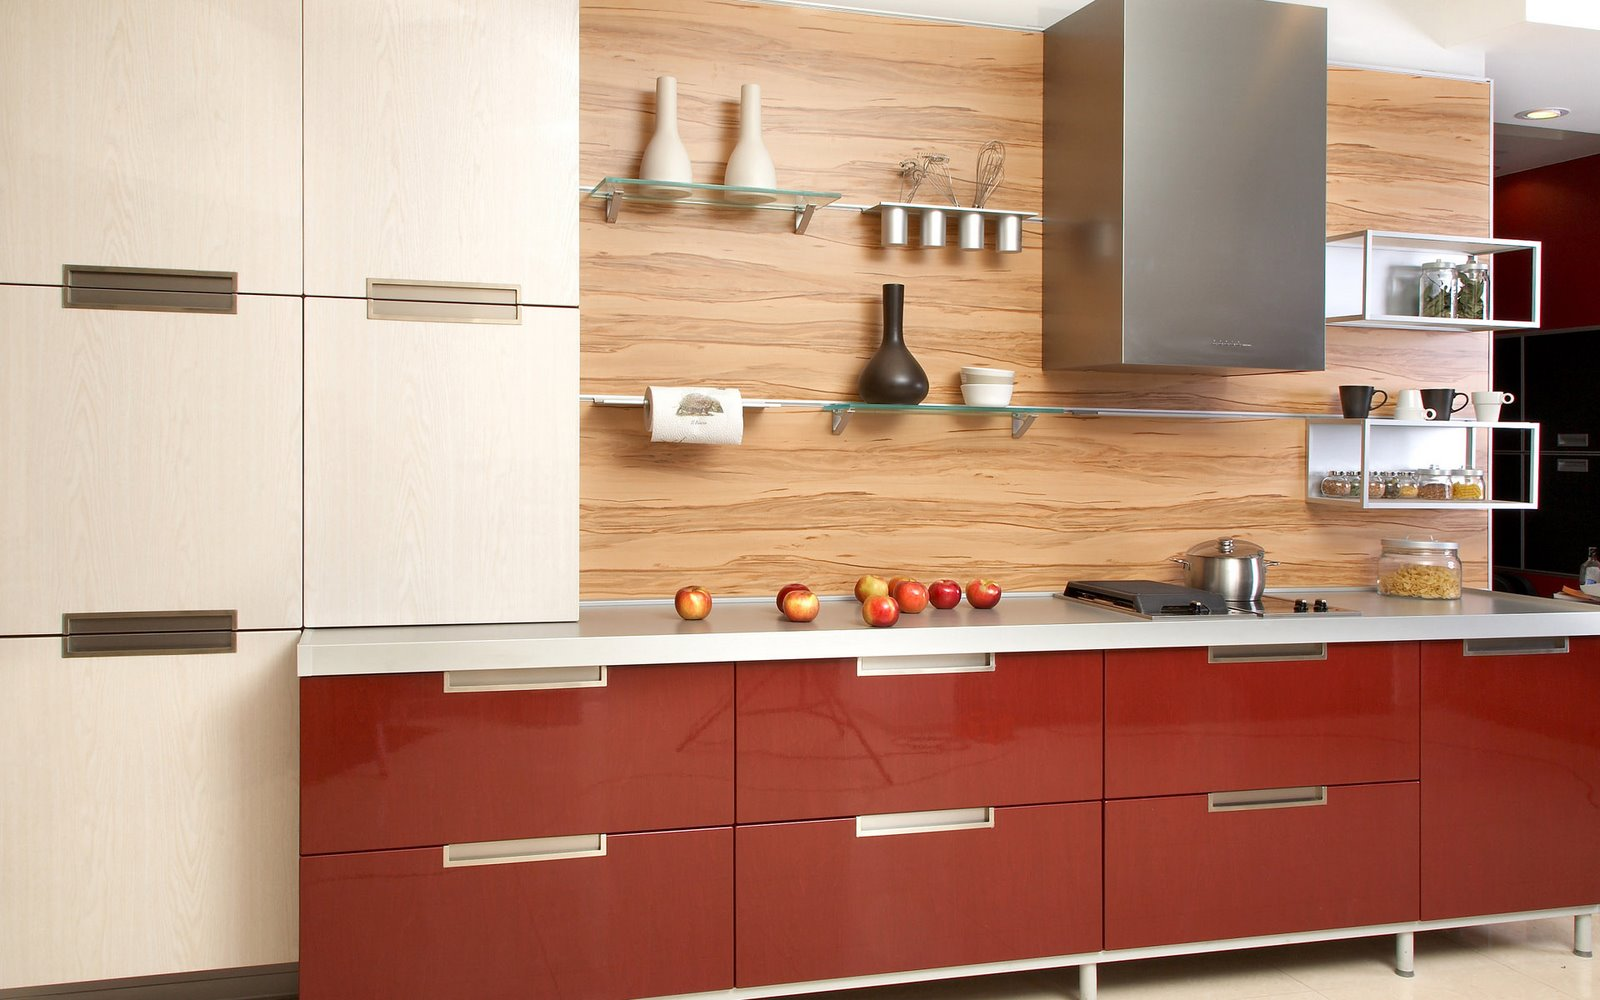 italian design kitchen clean lines sleek small kitchen designs creative minimalist kitchen design